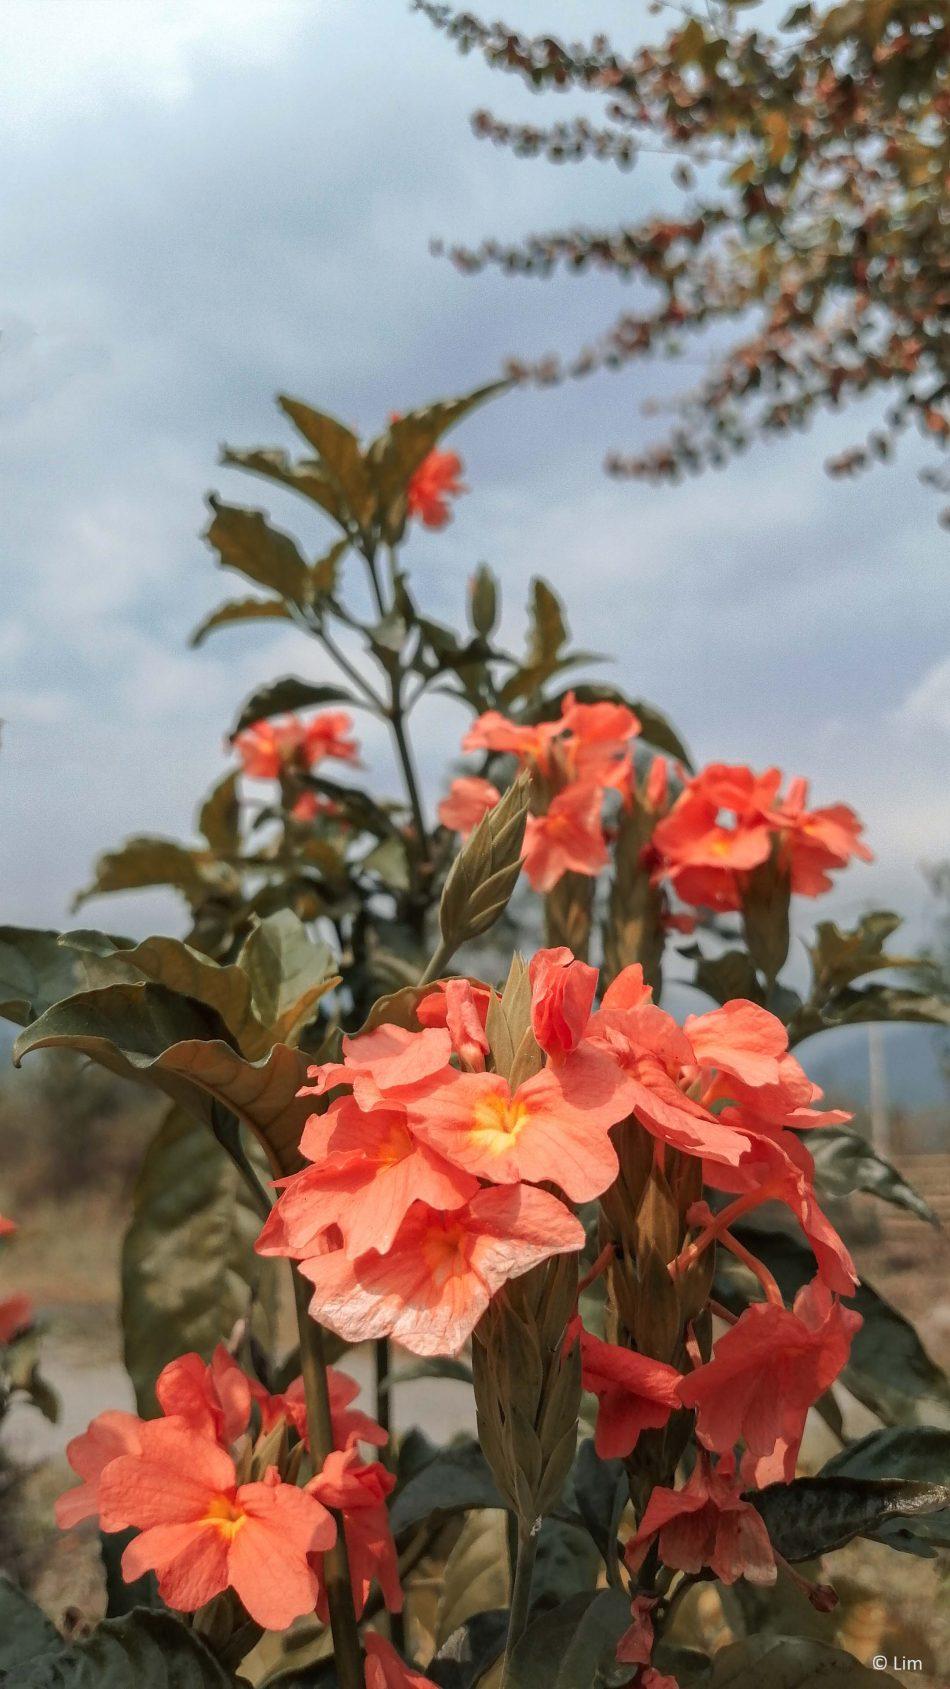 Firecracker Flower 4K Ultra HD Mobile Wallpaper